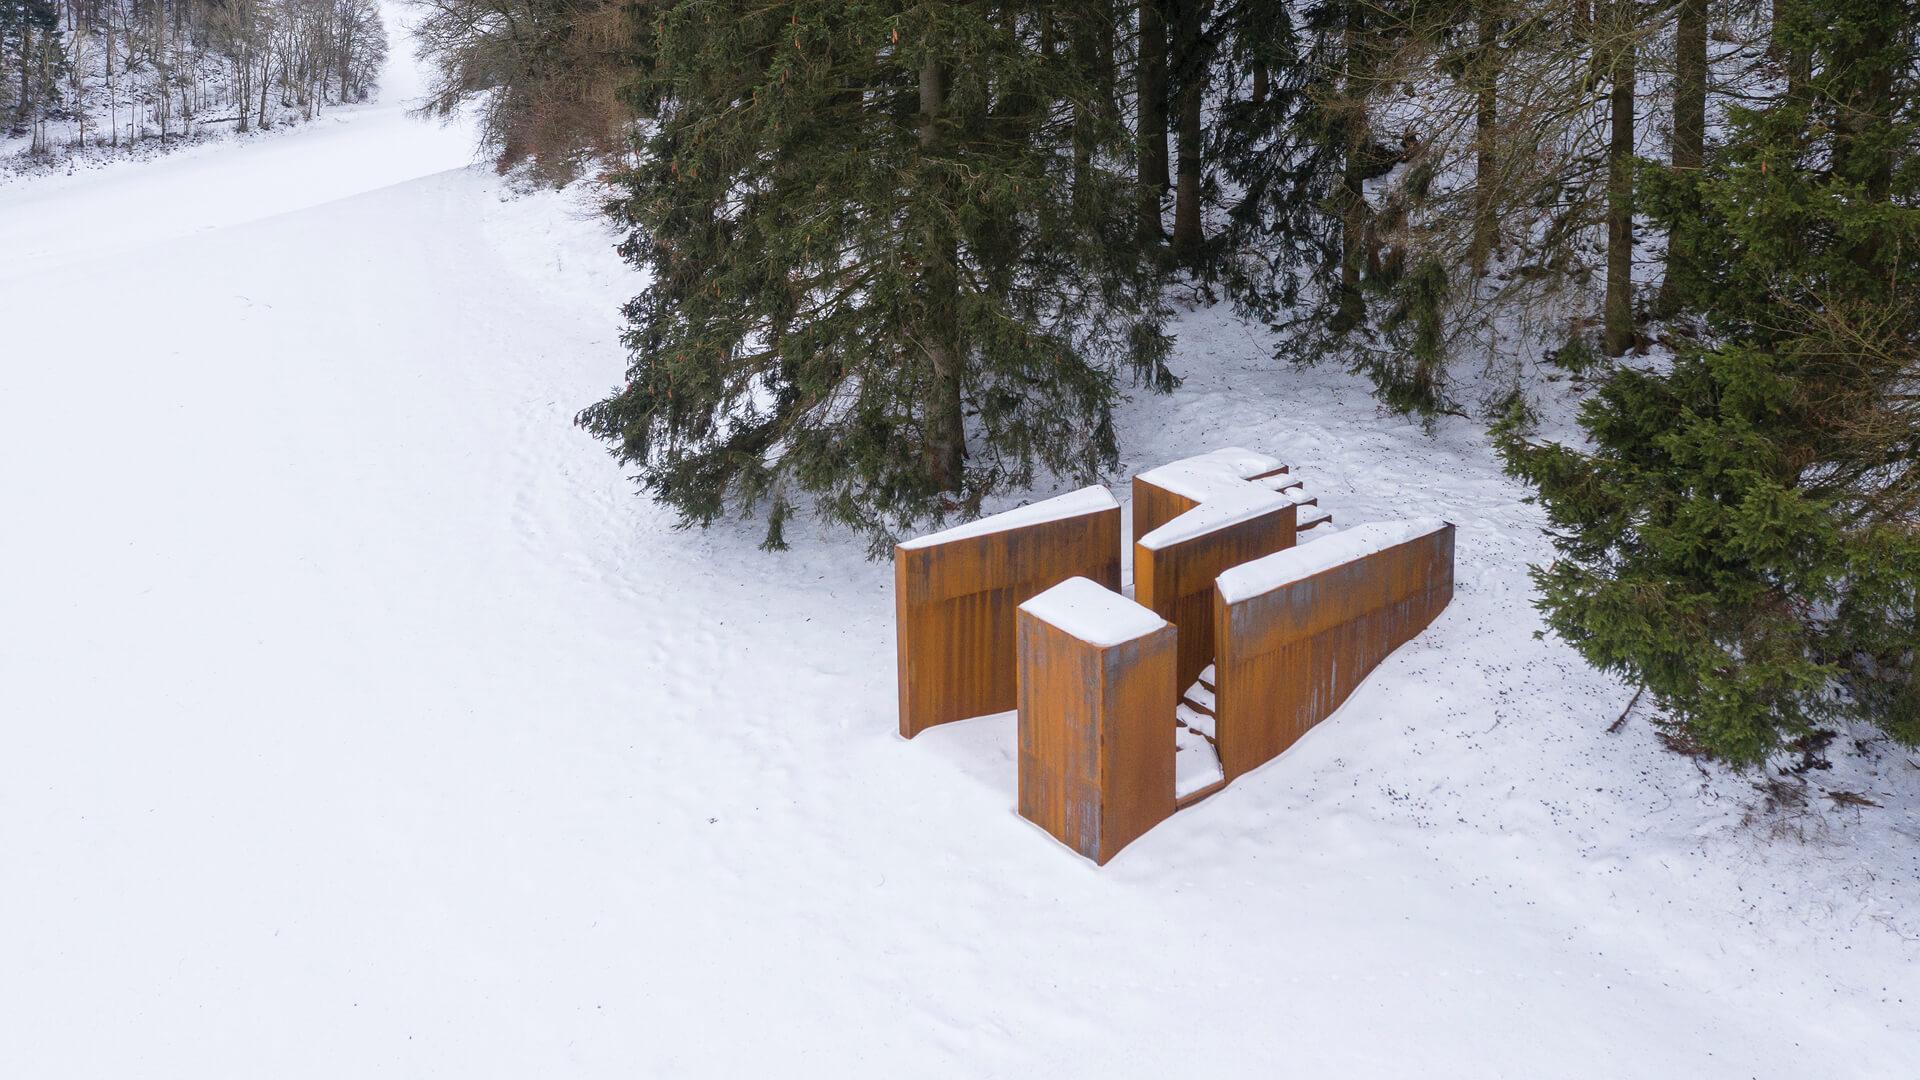 Pflug bird's eye view, winter photo | Open Mind Places and Ways of Life | Christoph Hesse | STIRworld